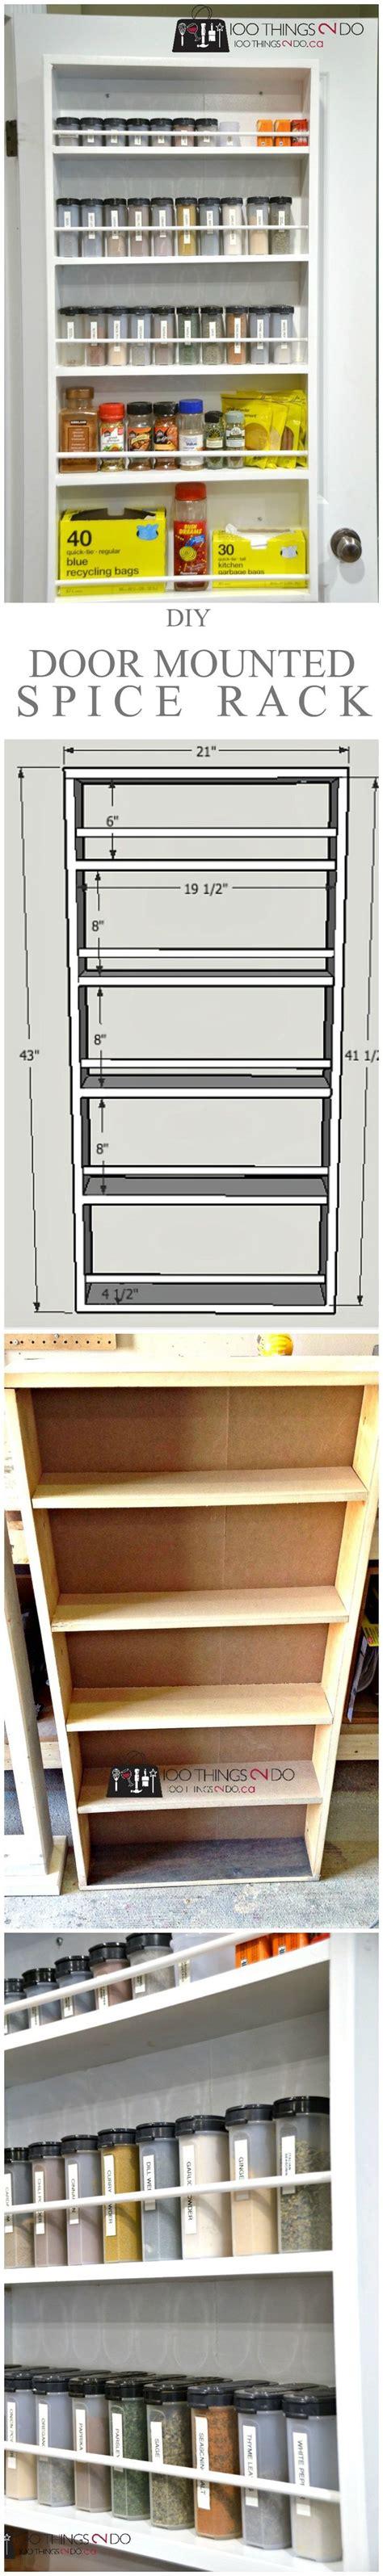 dyi kitchen cabinets best 25 door mounted spice rack ideas on 3494